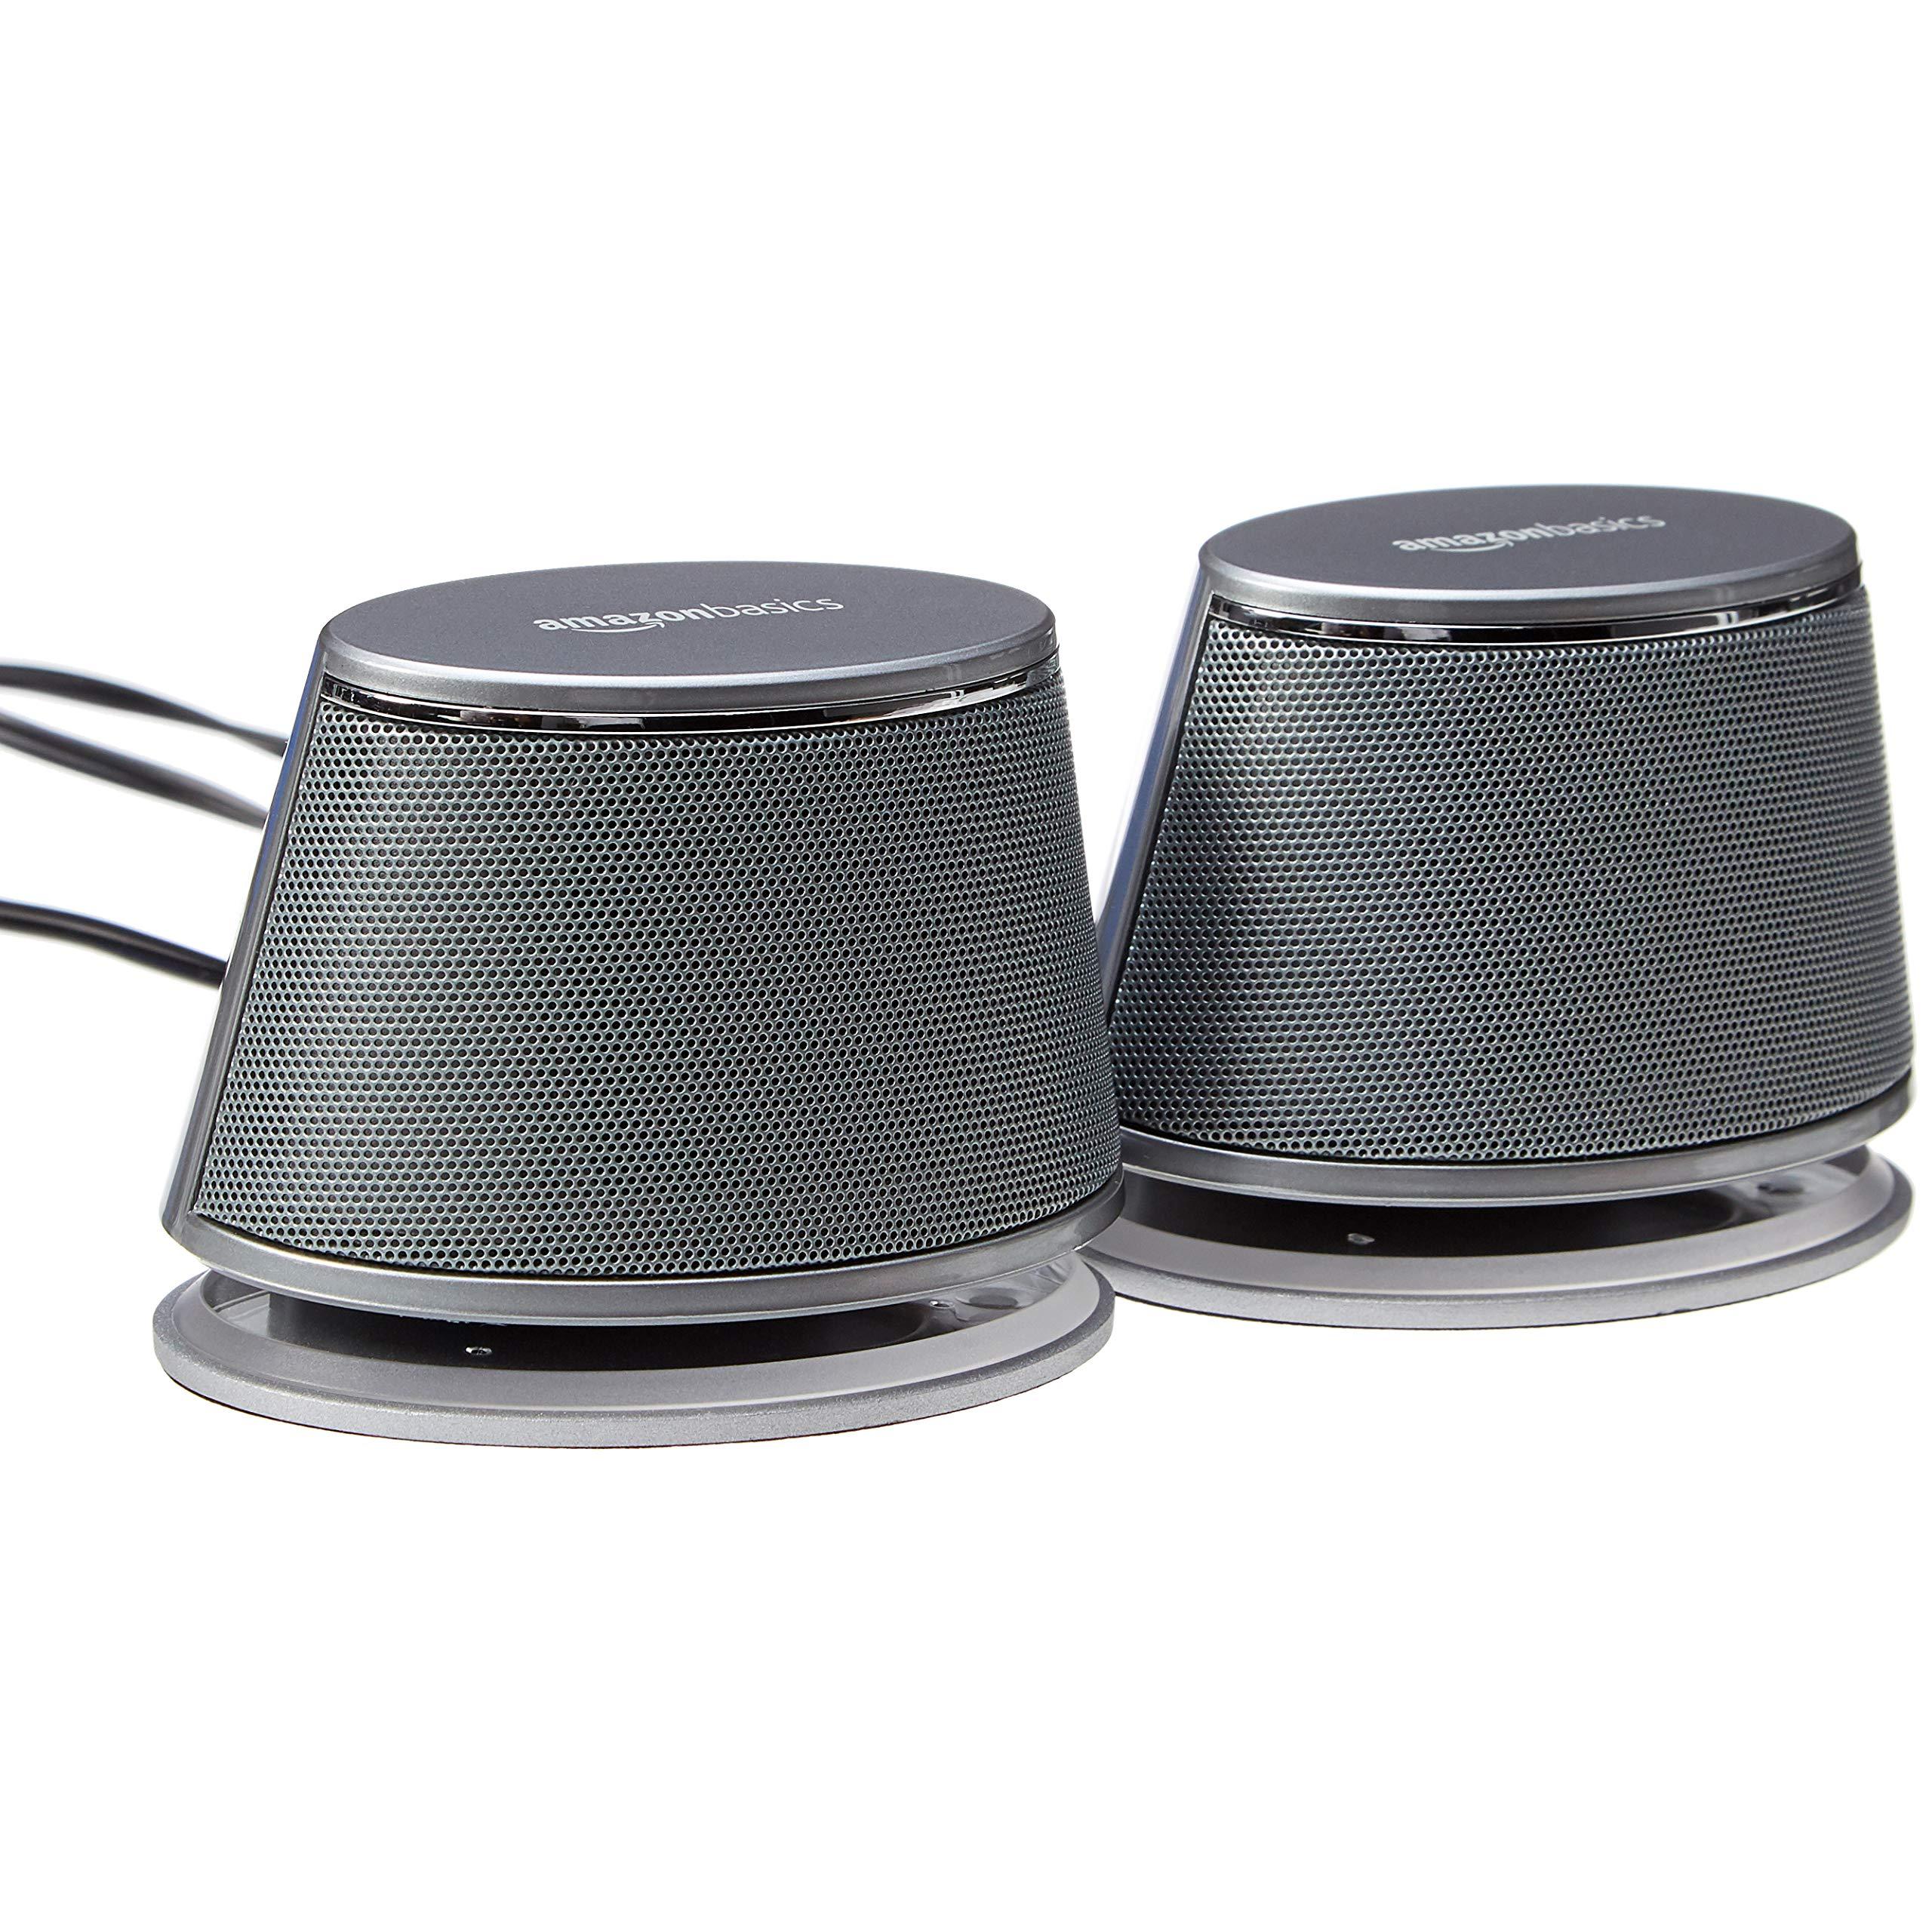 AmazonBasics USB Powered Computer Speakers Dynamic